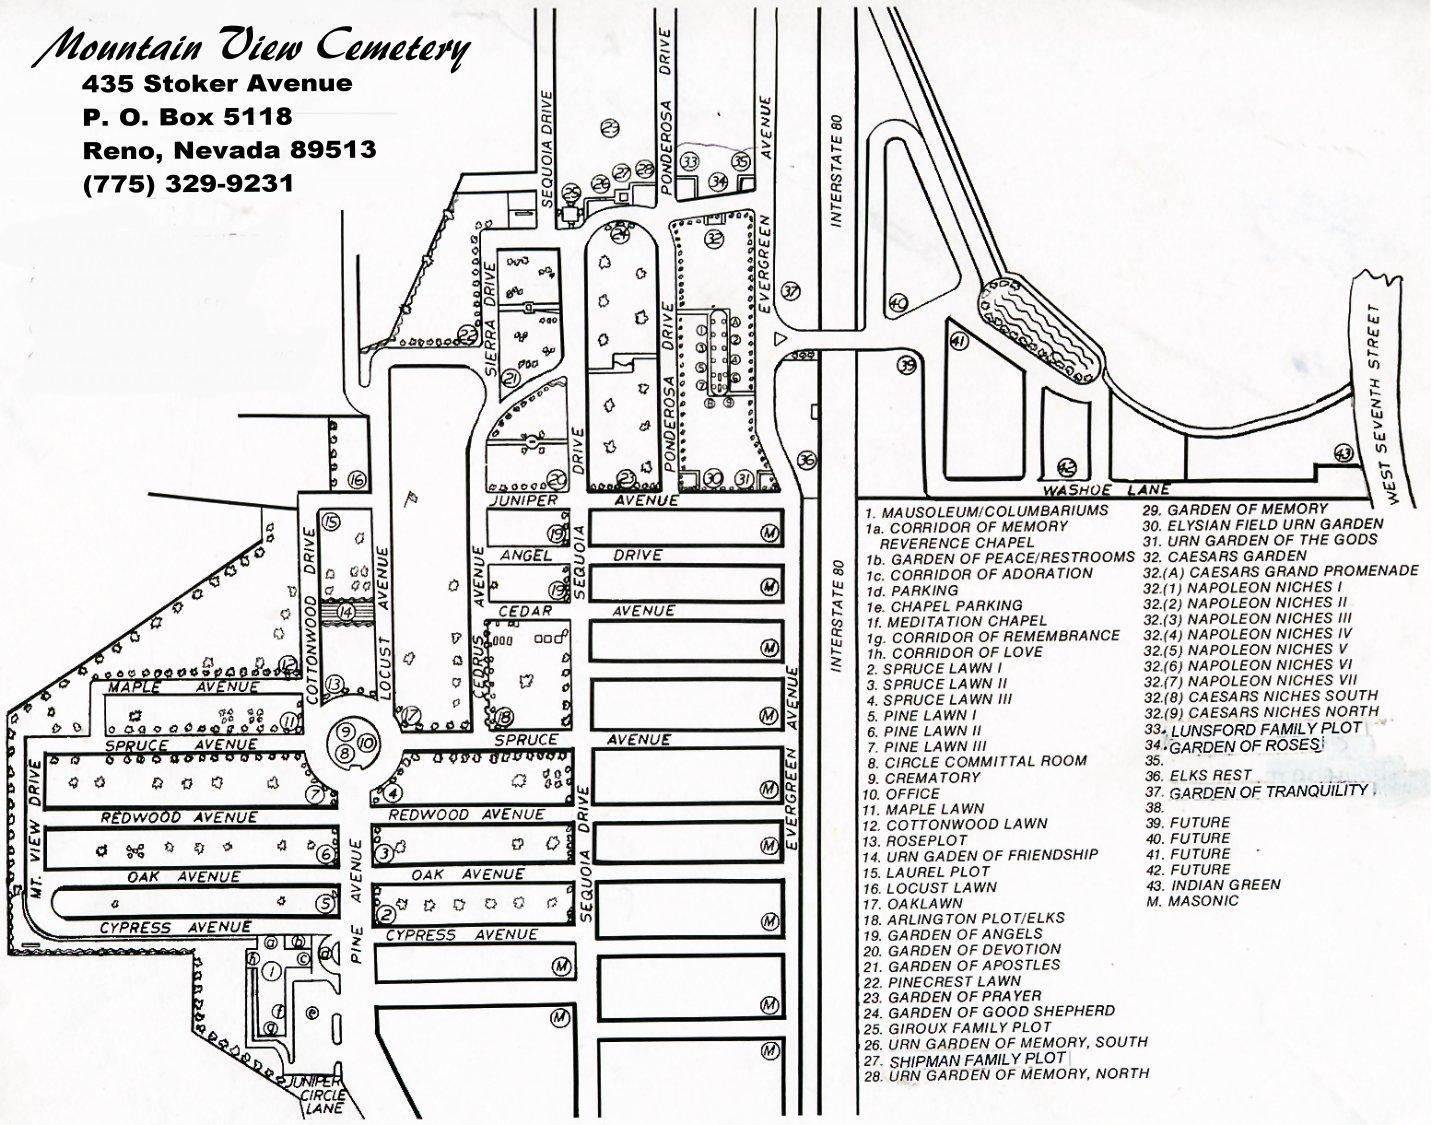 Cemetery - Street map of reno nv